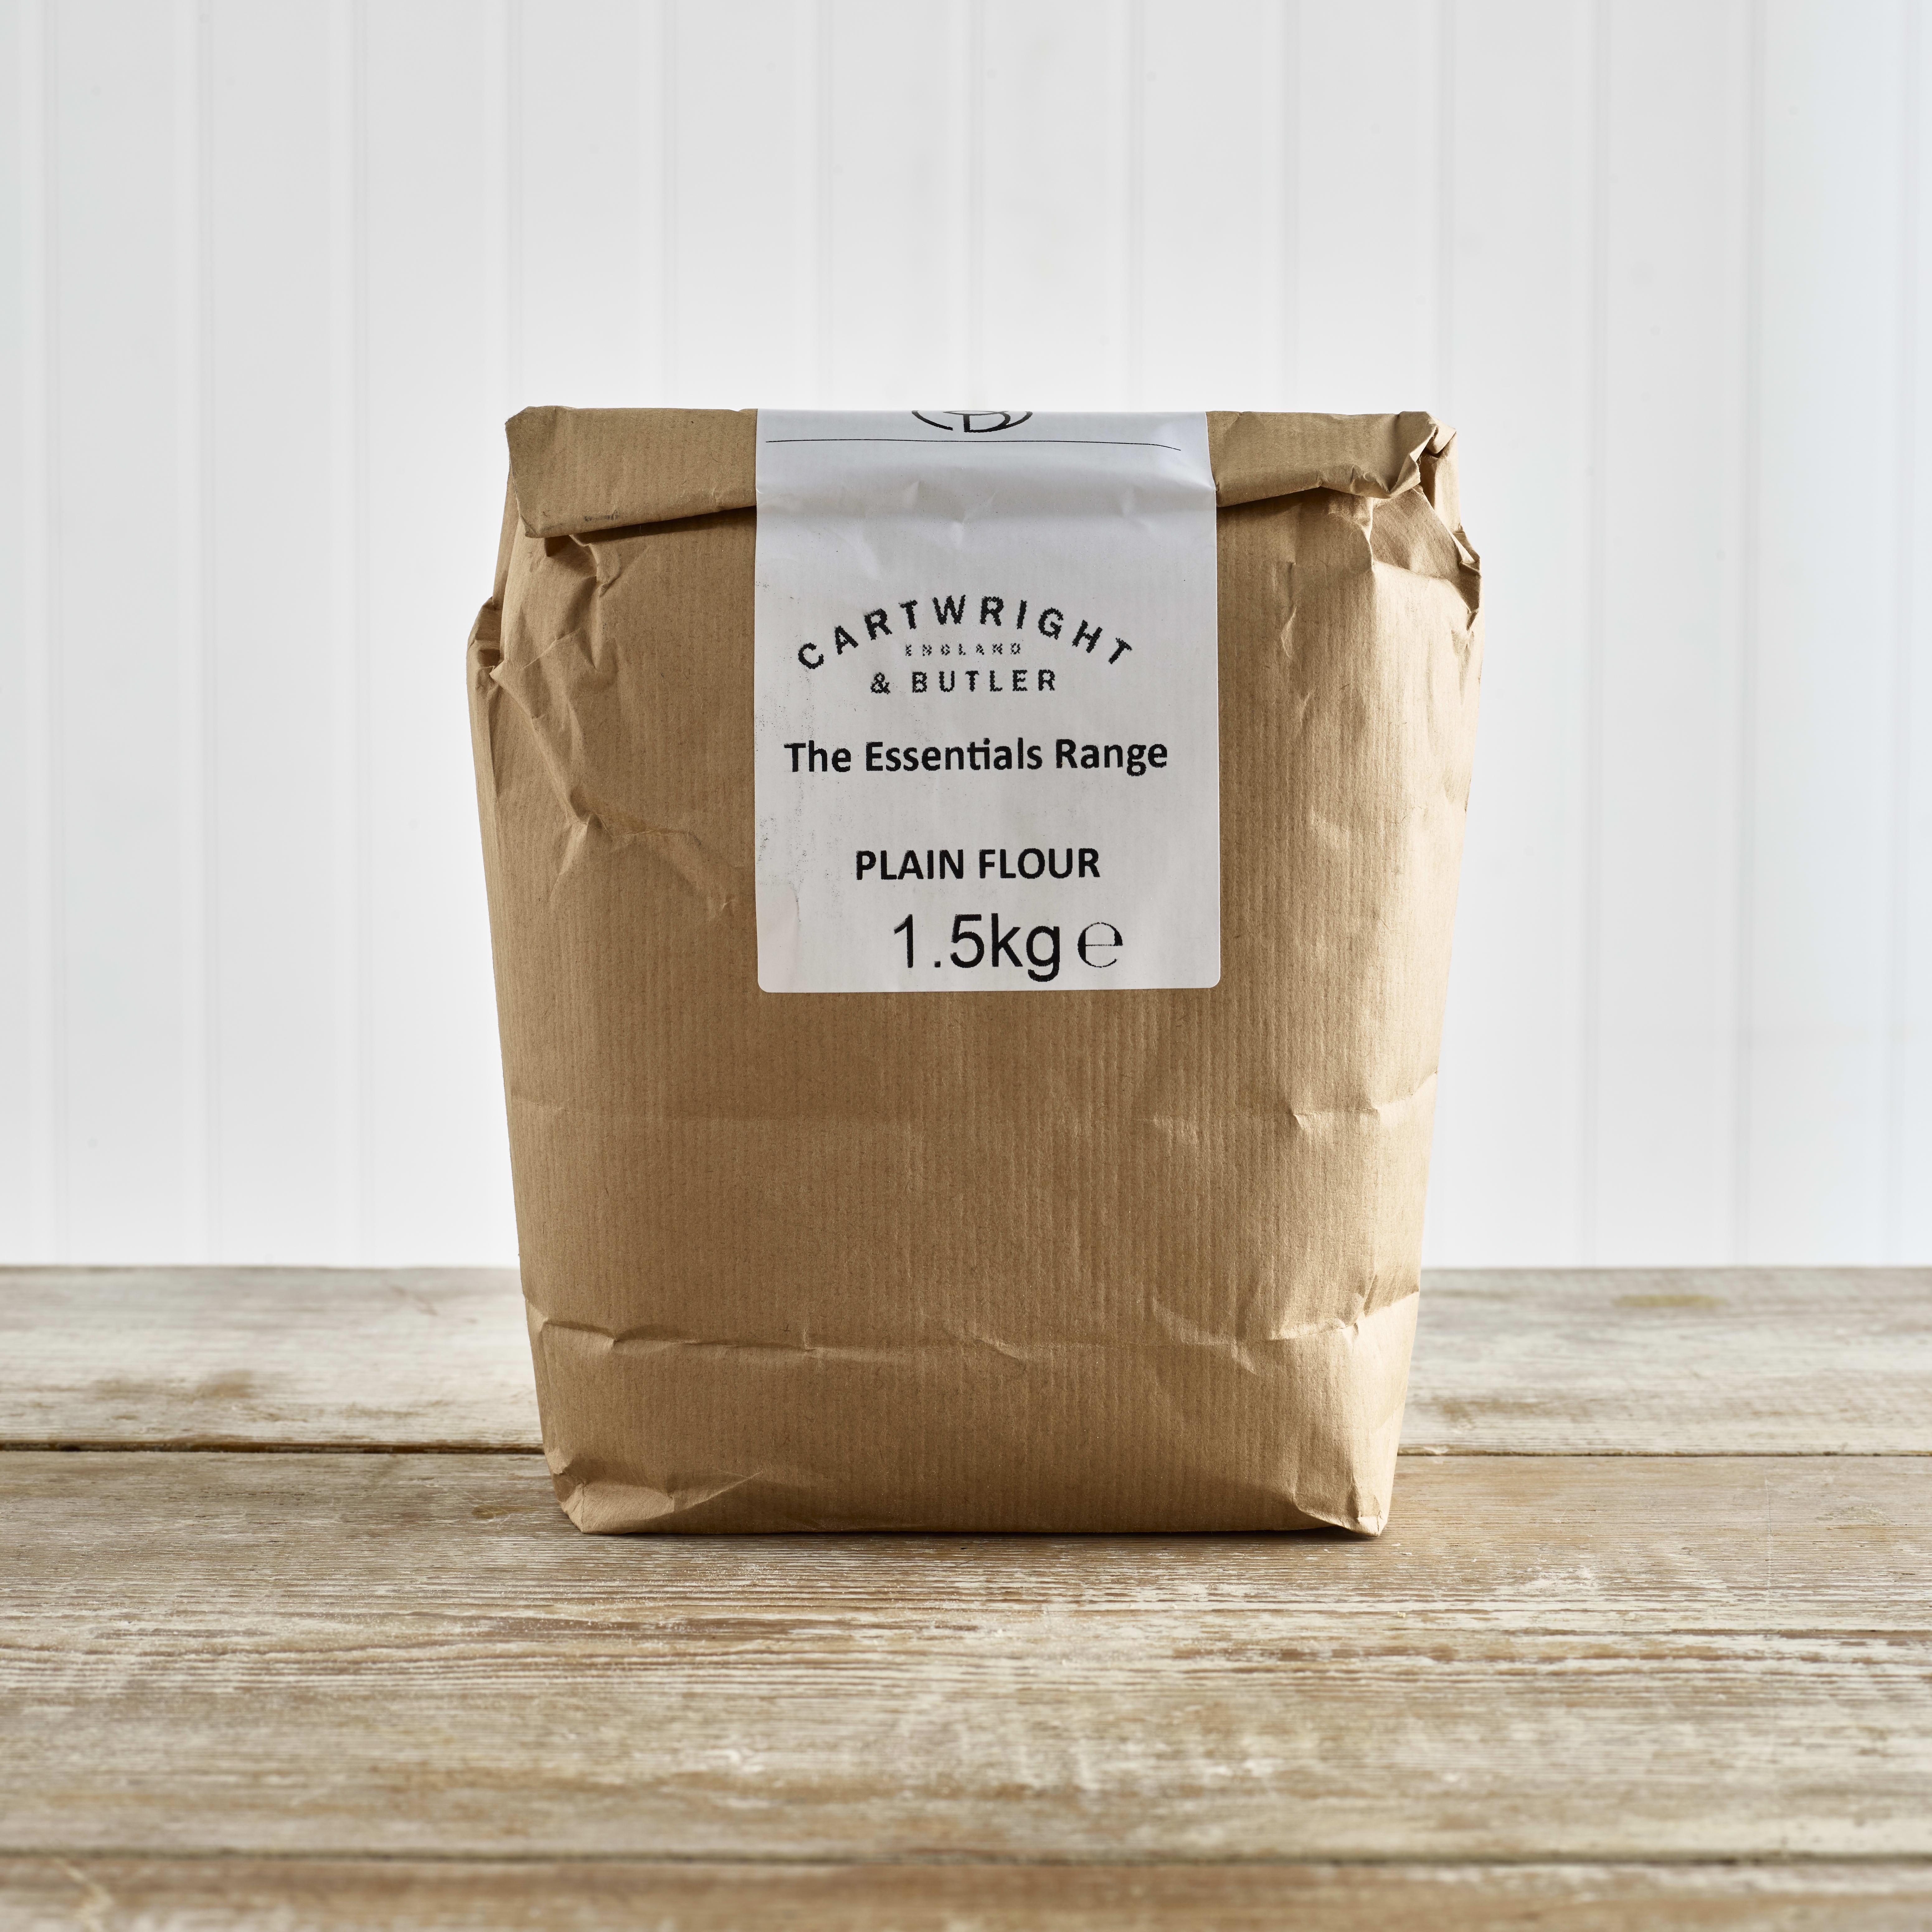 Cartwright & Butler Plain Flour, 1.5kg